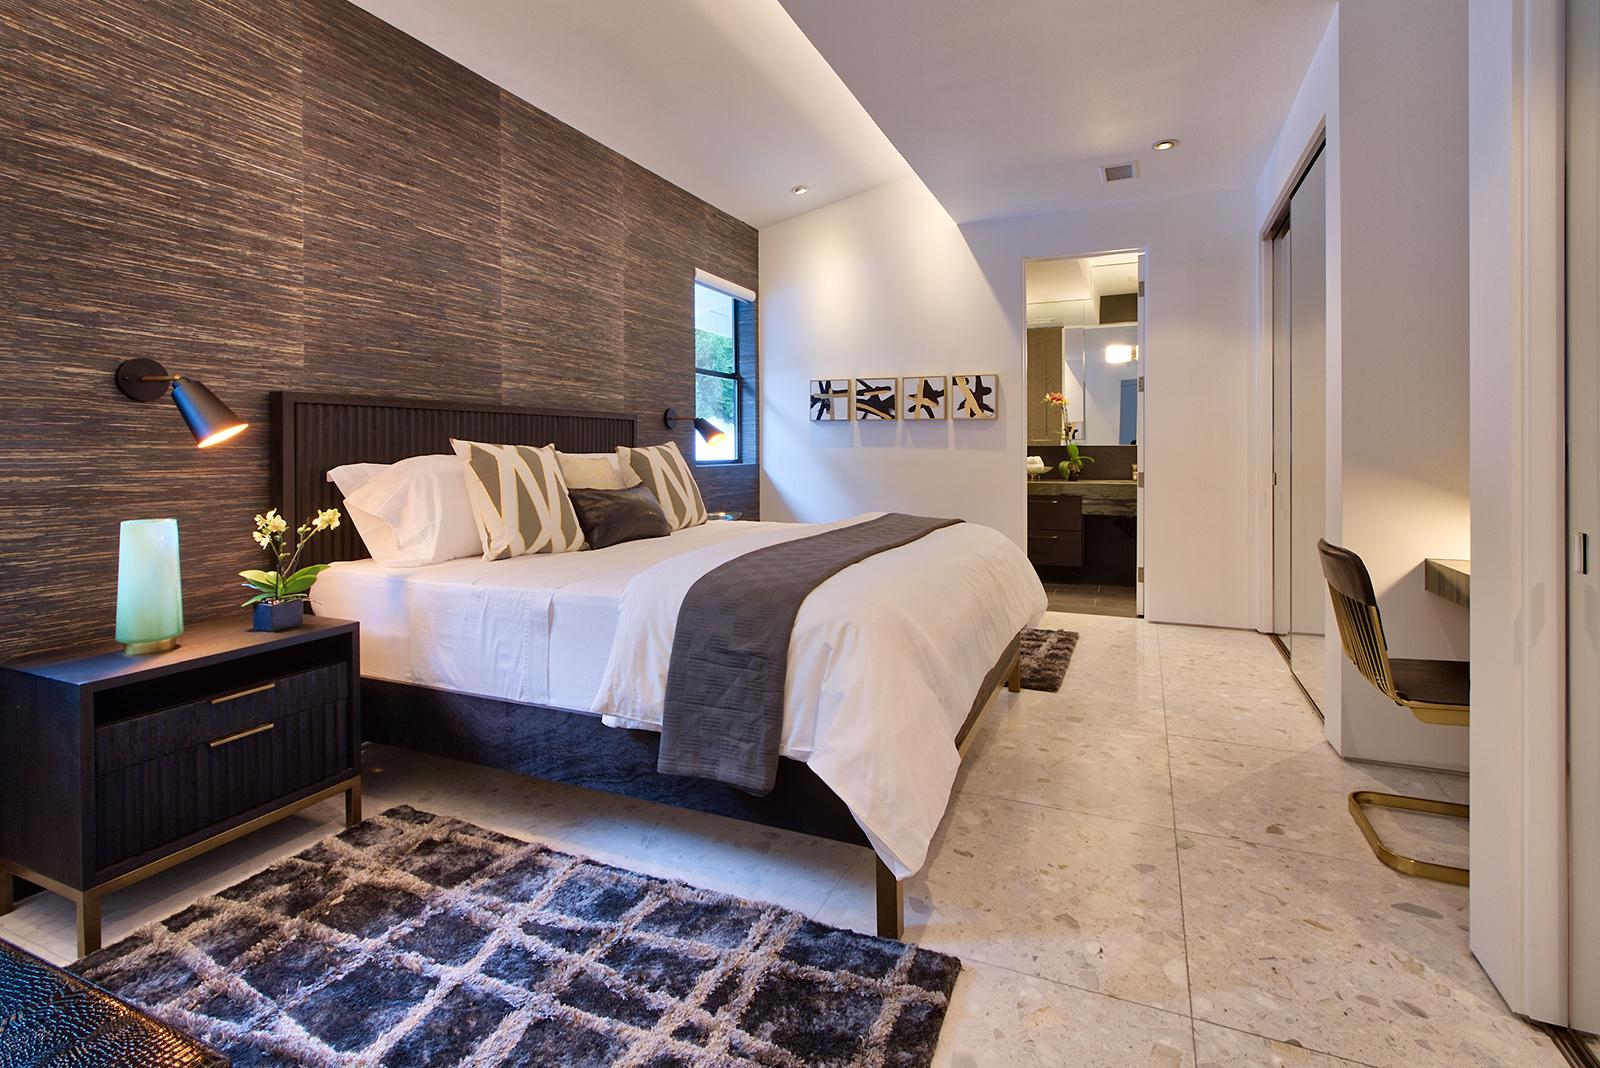 H-Bed-0.jpg